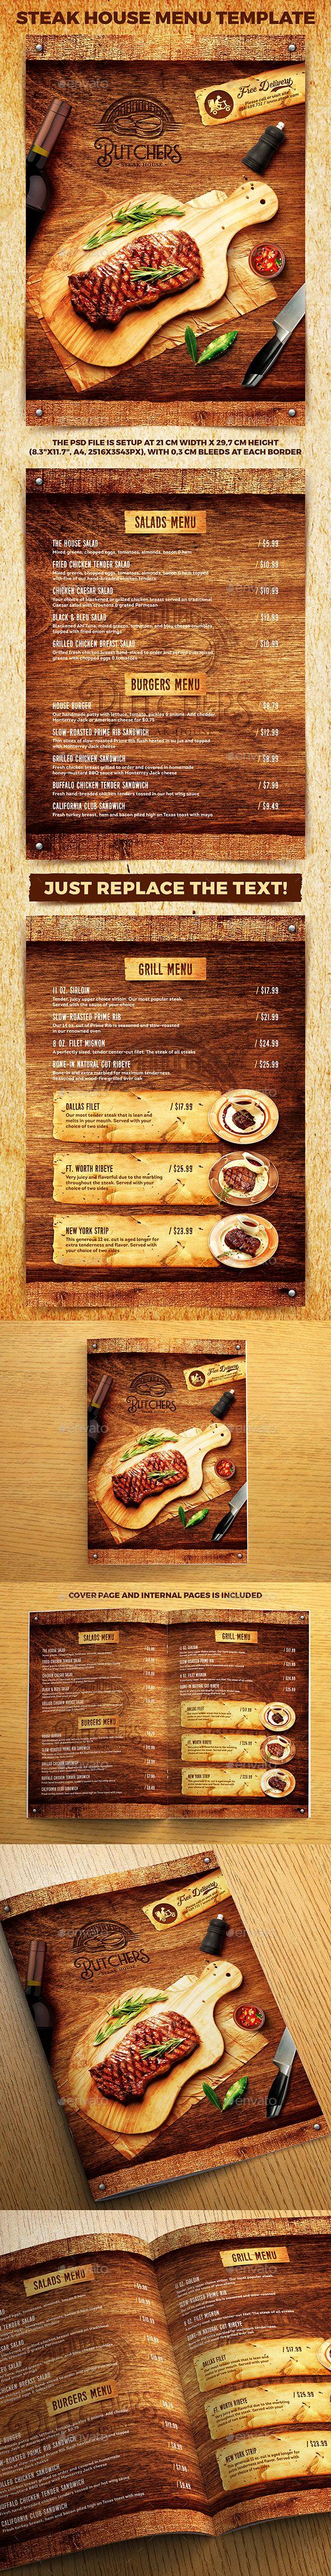 Steak House Menu Template - Food Menus Print Templates